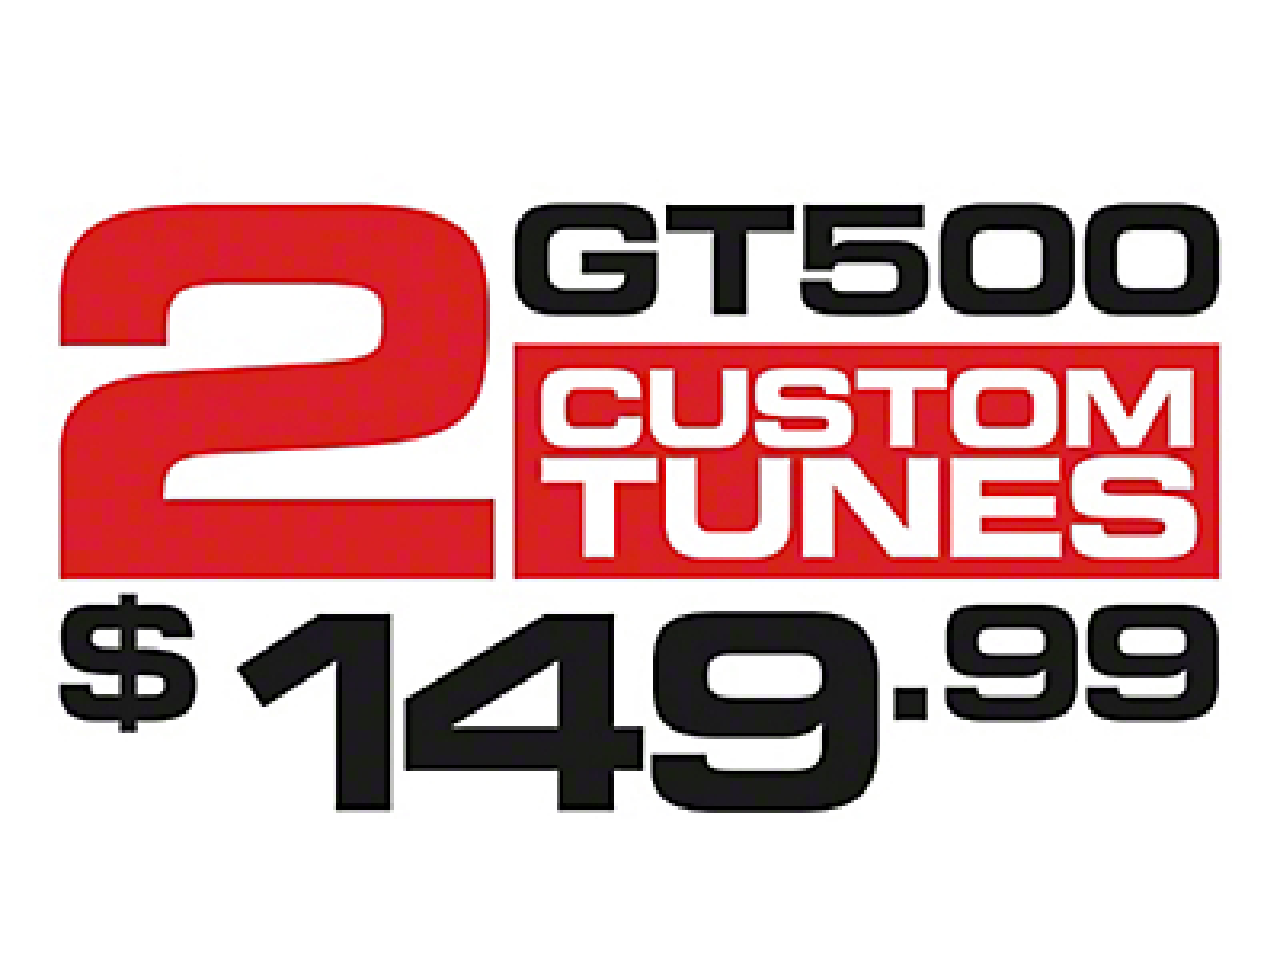 Bama 2 Custom Tunes (13-14 GT500)